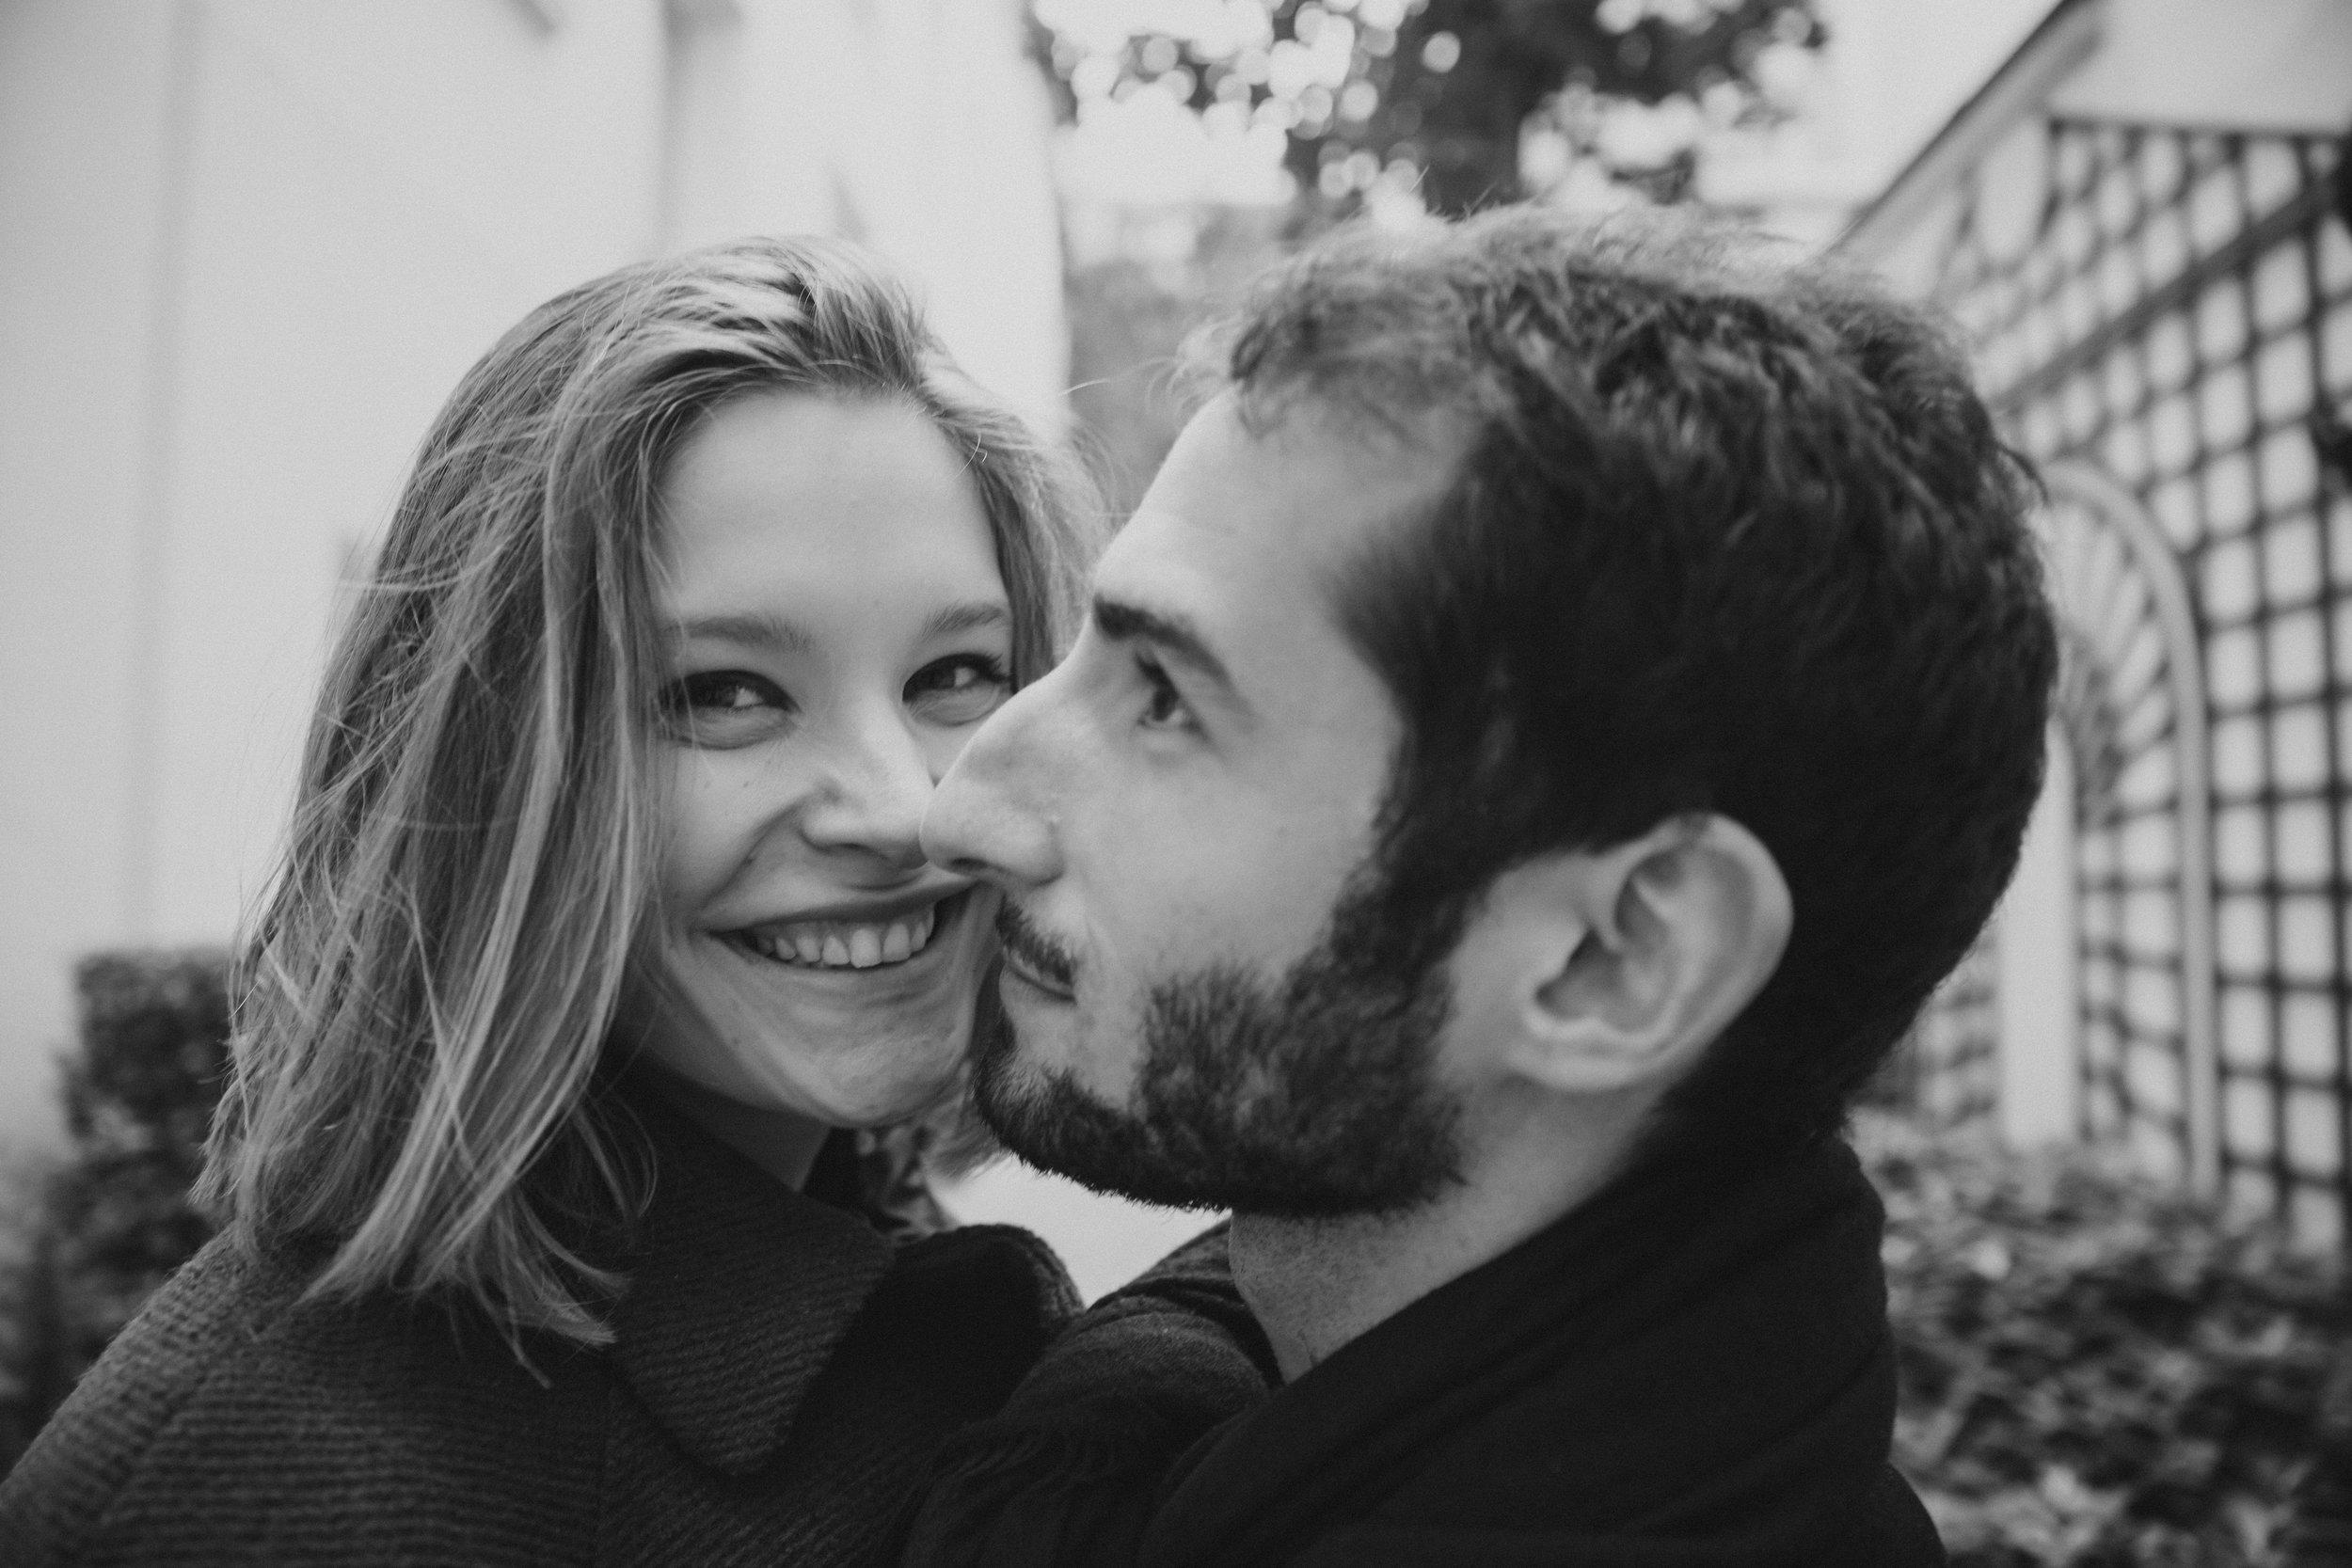 charlotte wedding photographer, paris couple session, paris engagement session, paris wedding photographer, east coast wedding photographer, les invalides photoshoot